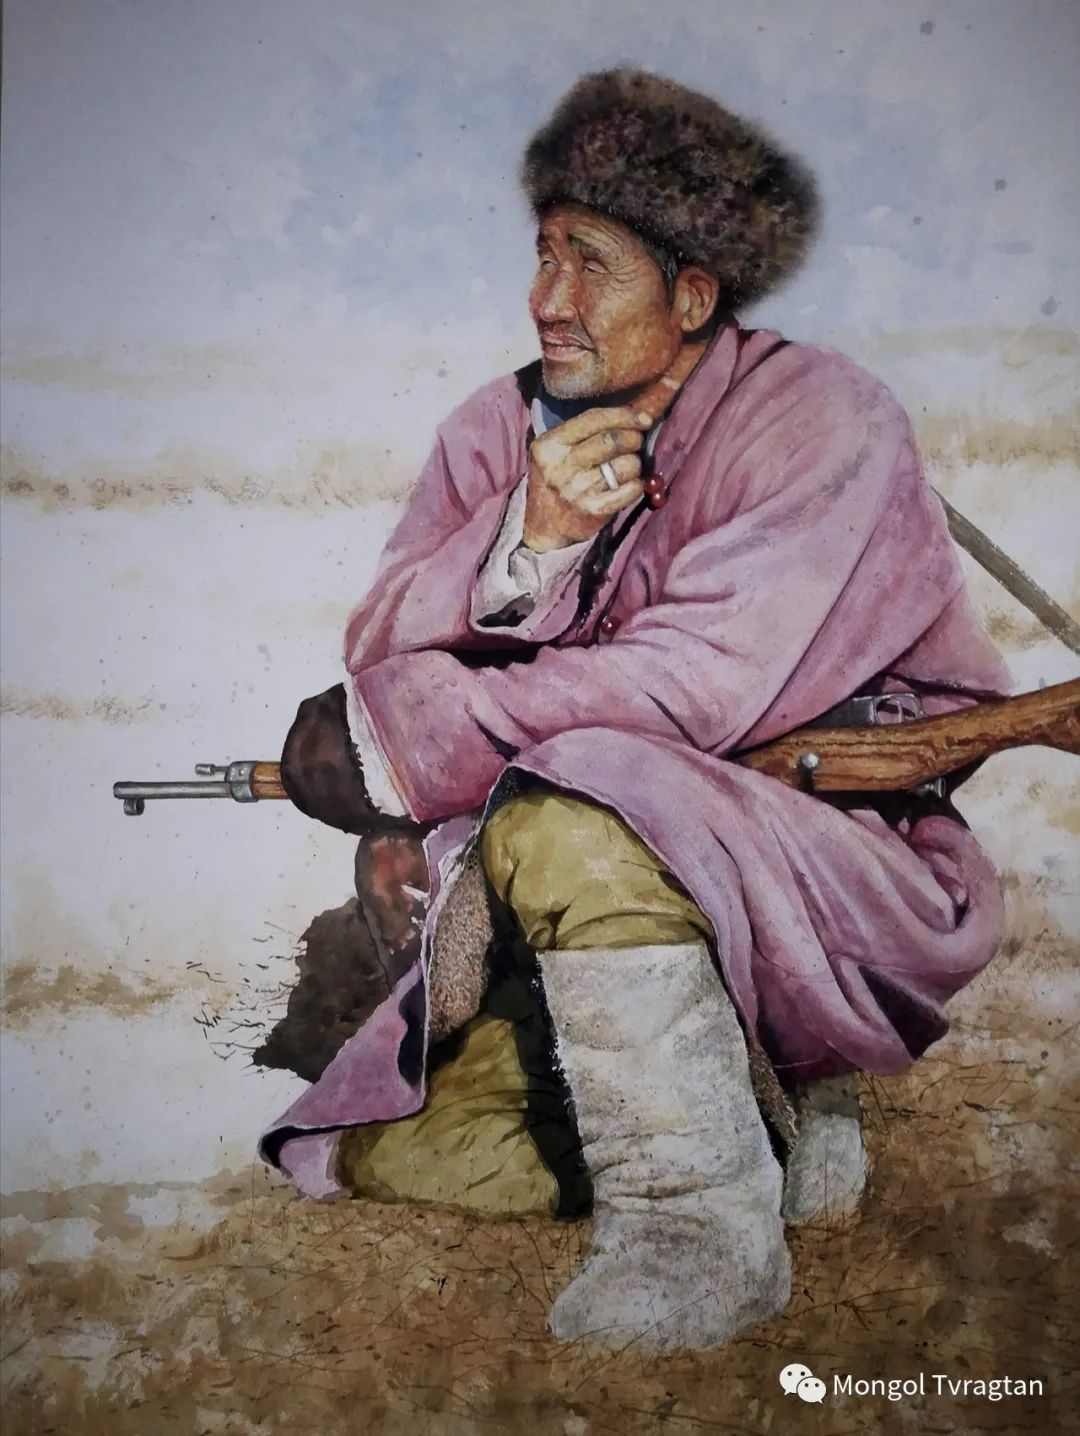 ᠣᠷᠠᠨ ᠵᠢᠷᠣᠭ-Лхагвасүрэн 第6张 ᠣᠷᠠᠨ ᠵᠢᠷᠣᠭ-Лхагвасүрэн 蒙古画廊